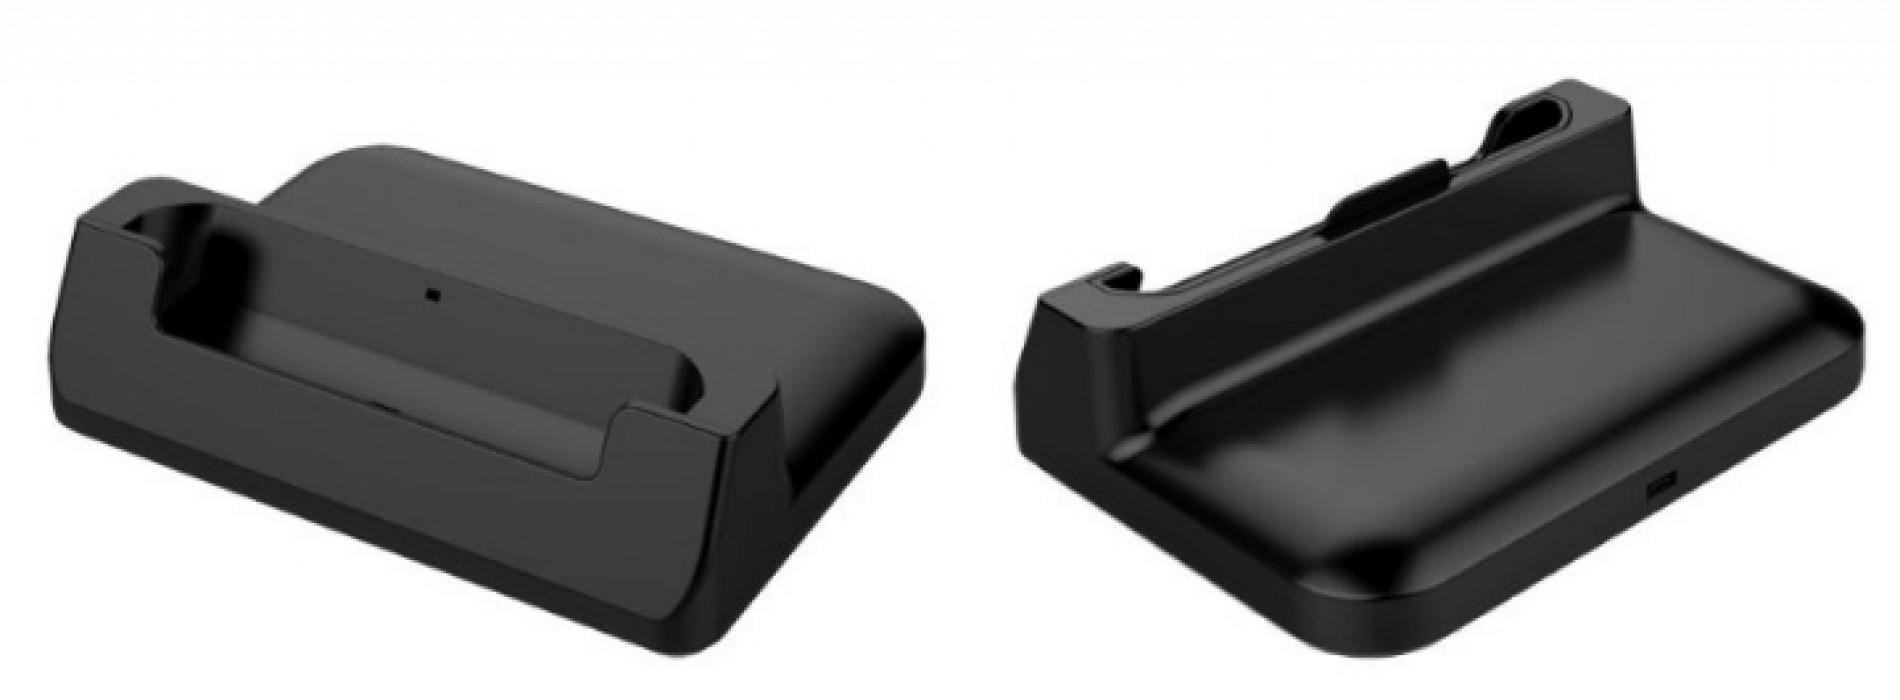 Nexus 7 Case-Compatible Desktop Sync and Charge Cradle review